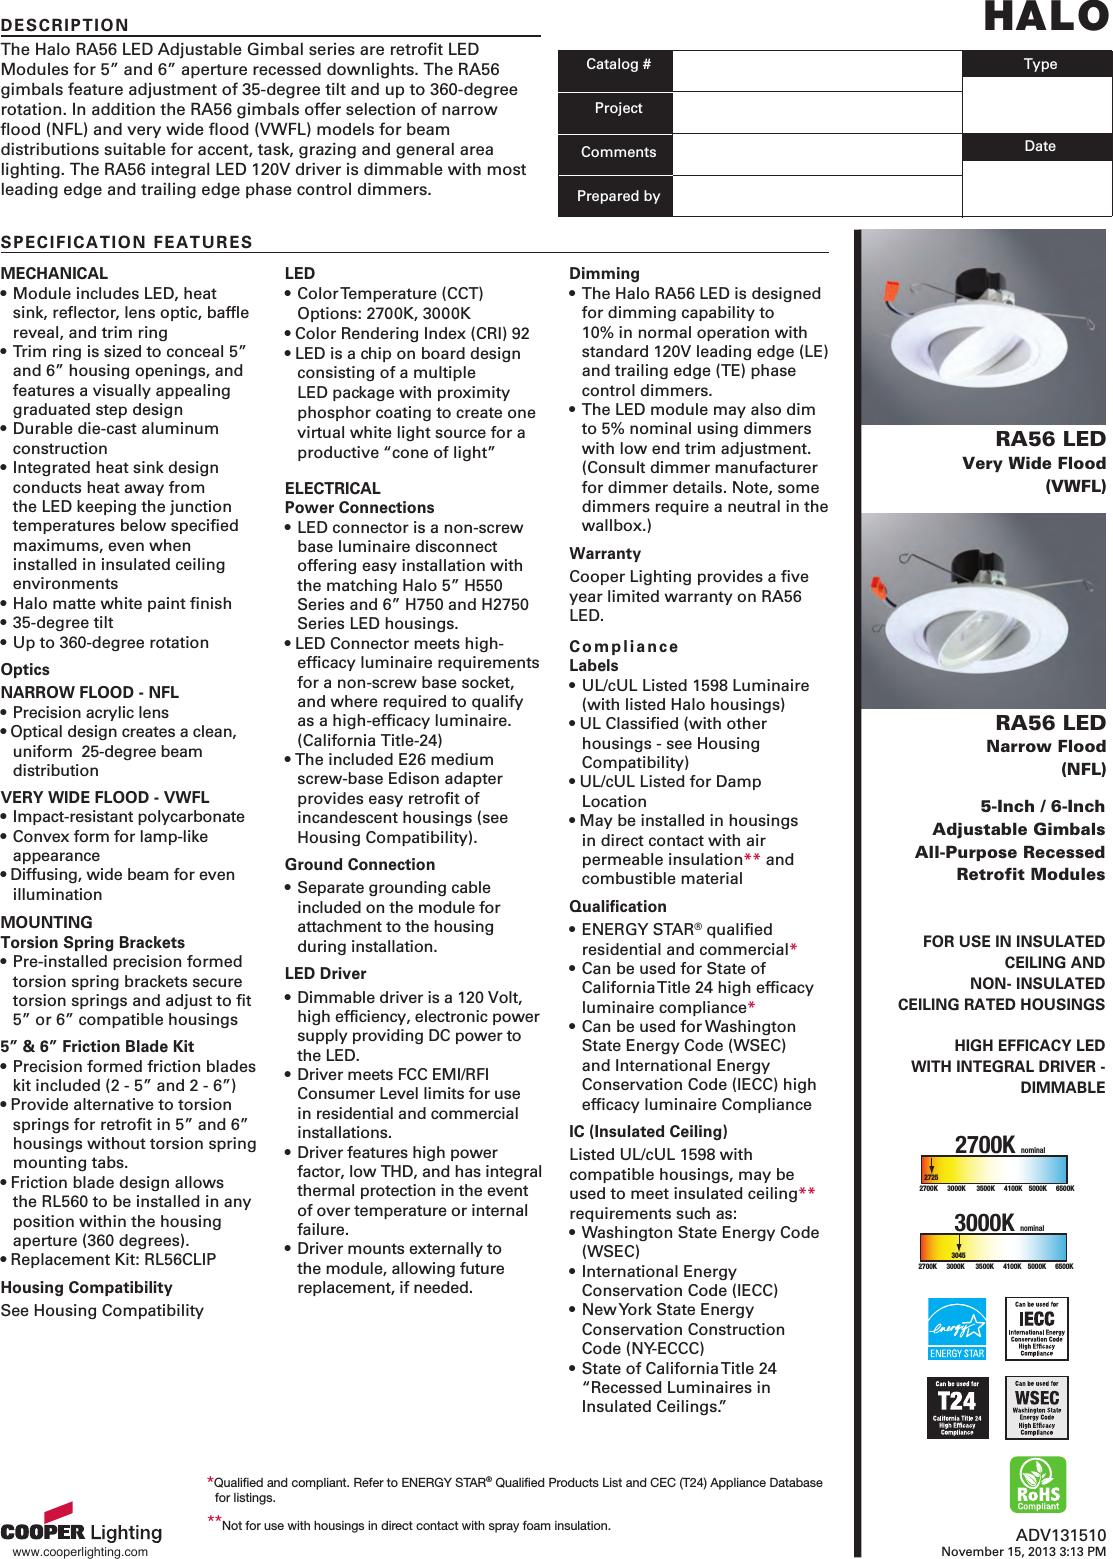 elco data et 500 manual livinwho rh livinwho307 weebly com Repair Appliances Yourself GE Appliance Manual